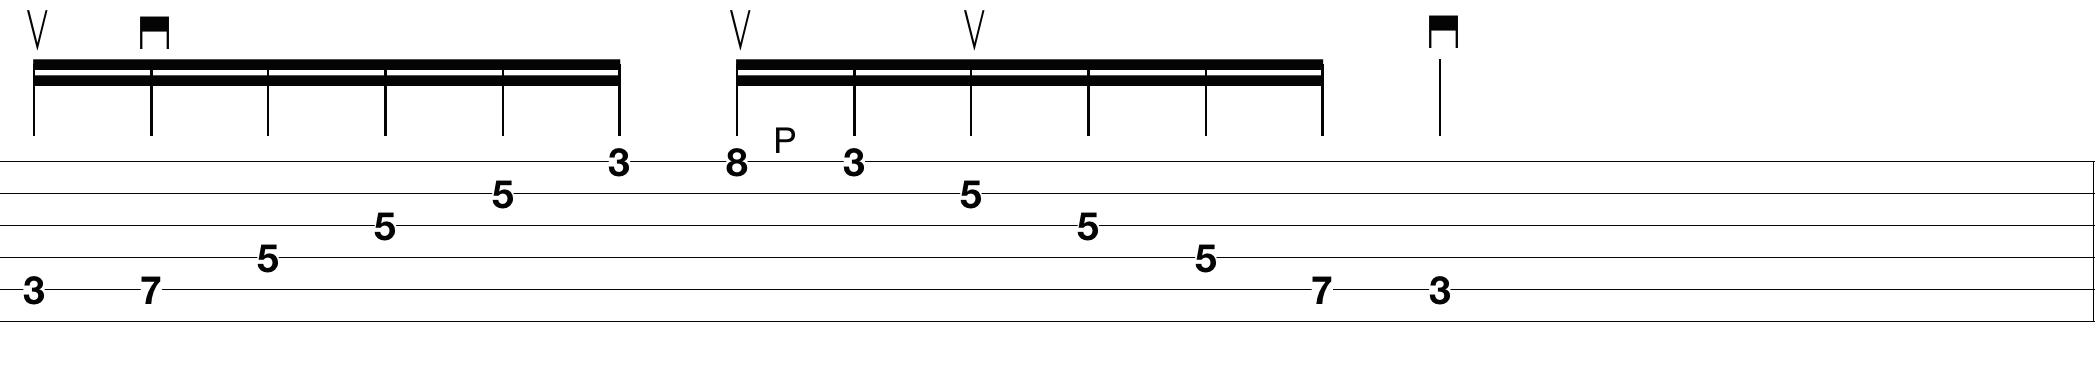 shredding-on-guitar_1.png